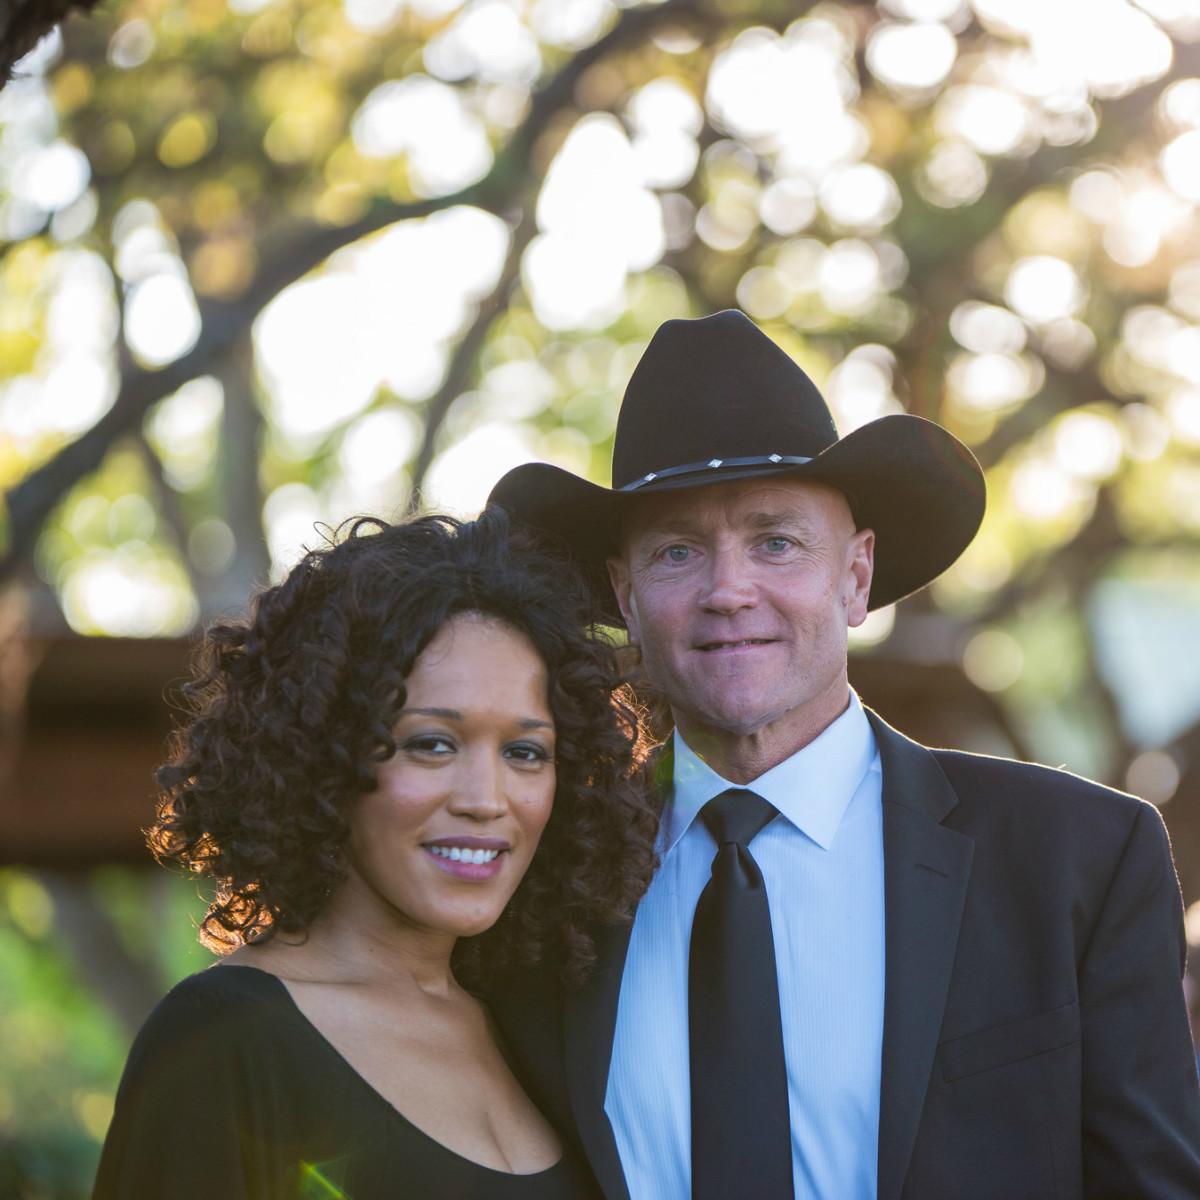 Bandana Ball April 2016 Ronald McDonald House Charities of Central Texas Aisha Jasek Wes Jasek